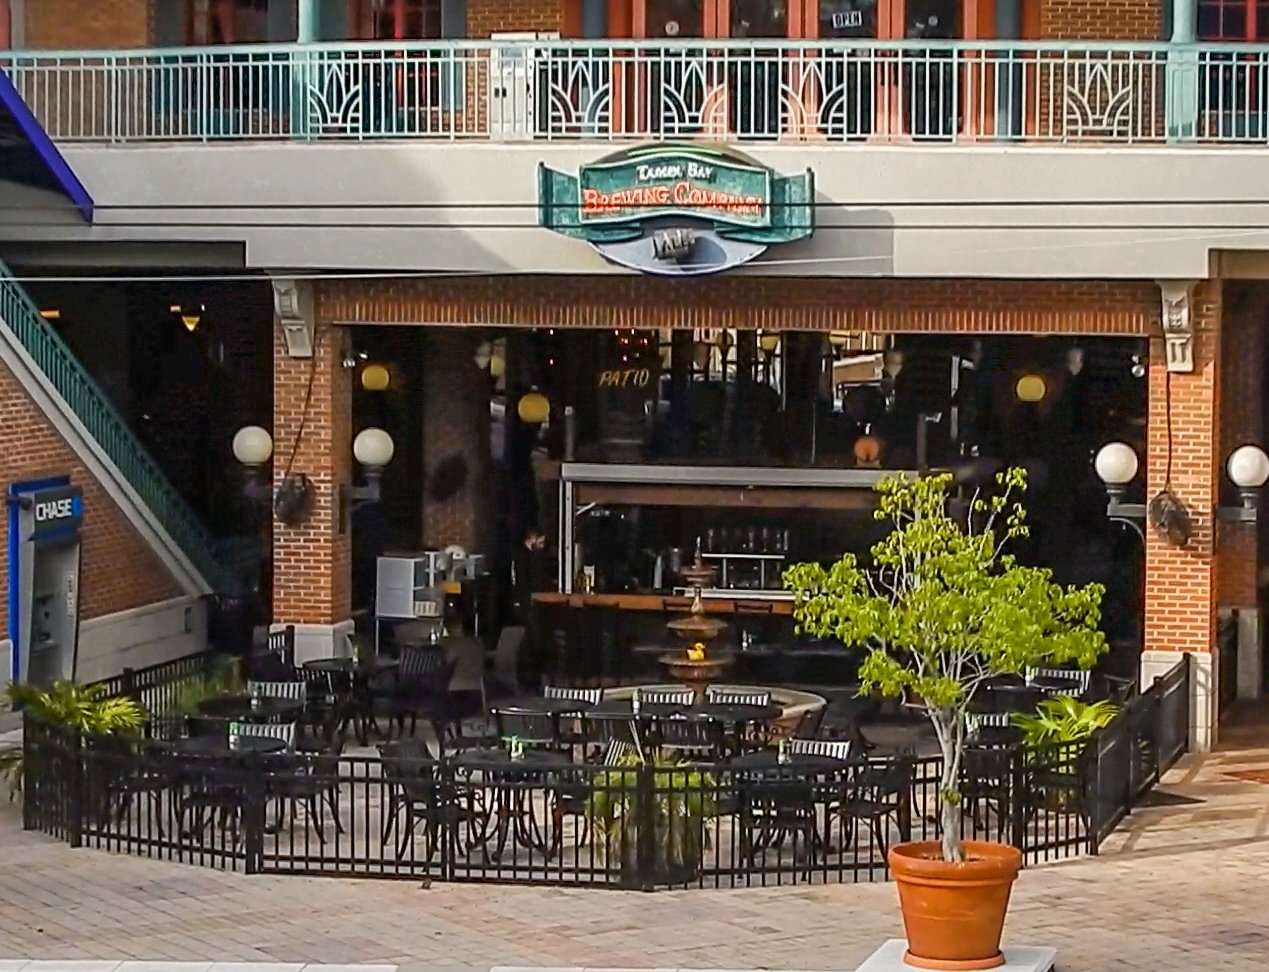 Tampa Bay Brewing Company Ybor Photo News 247